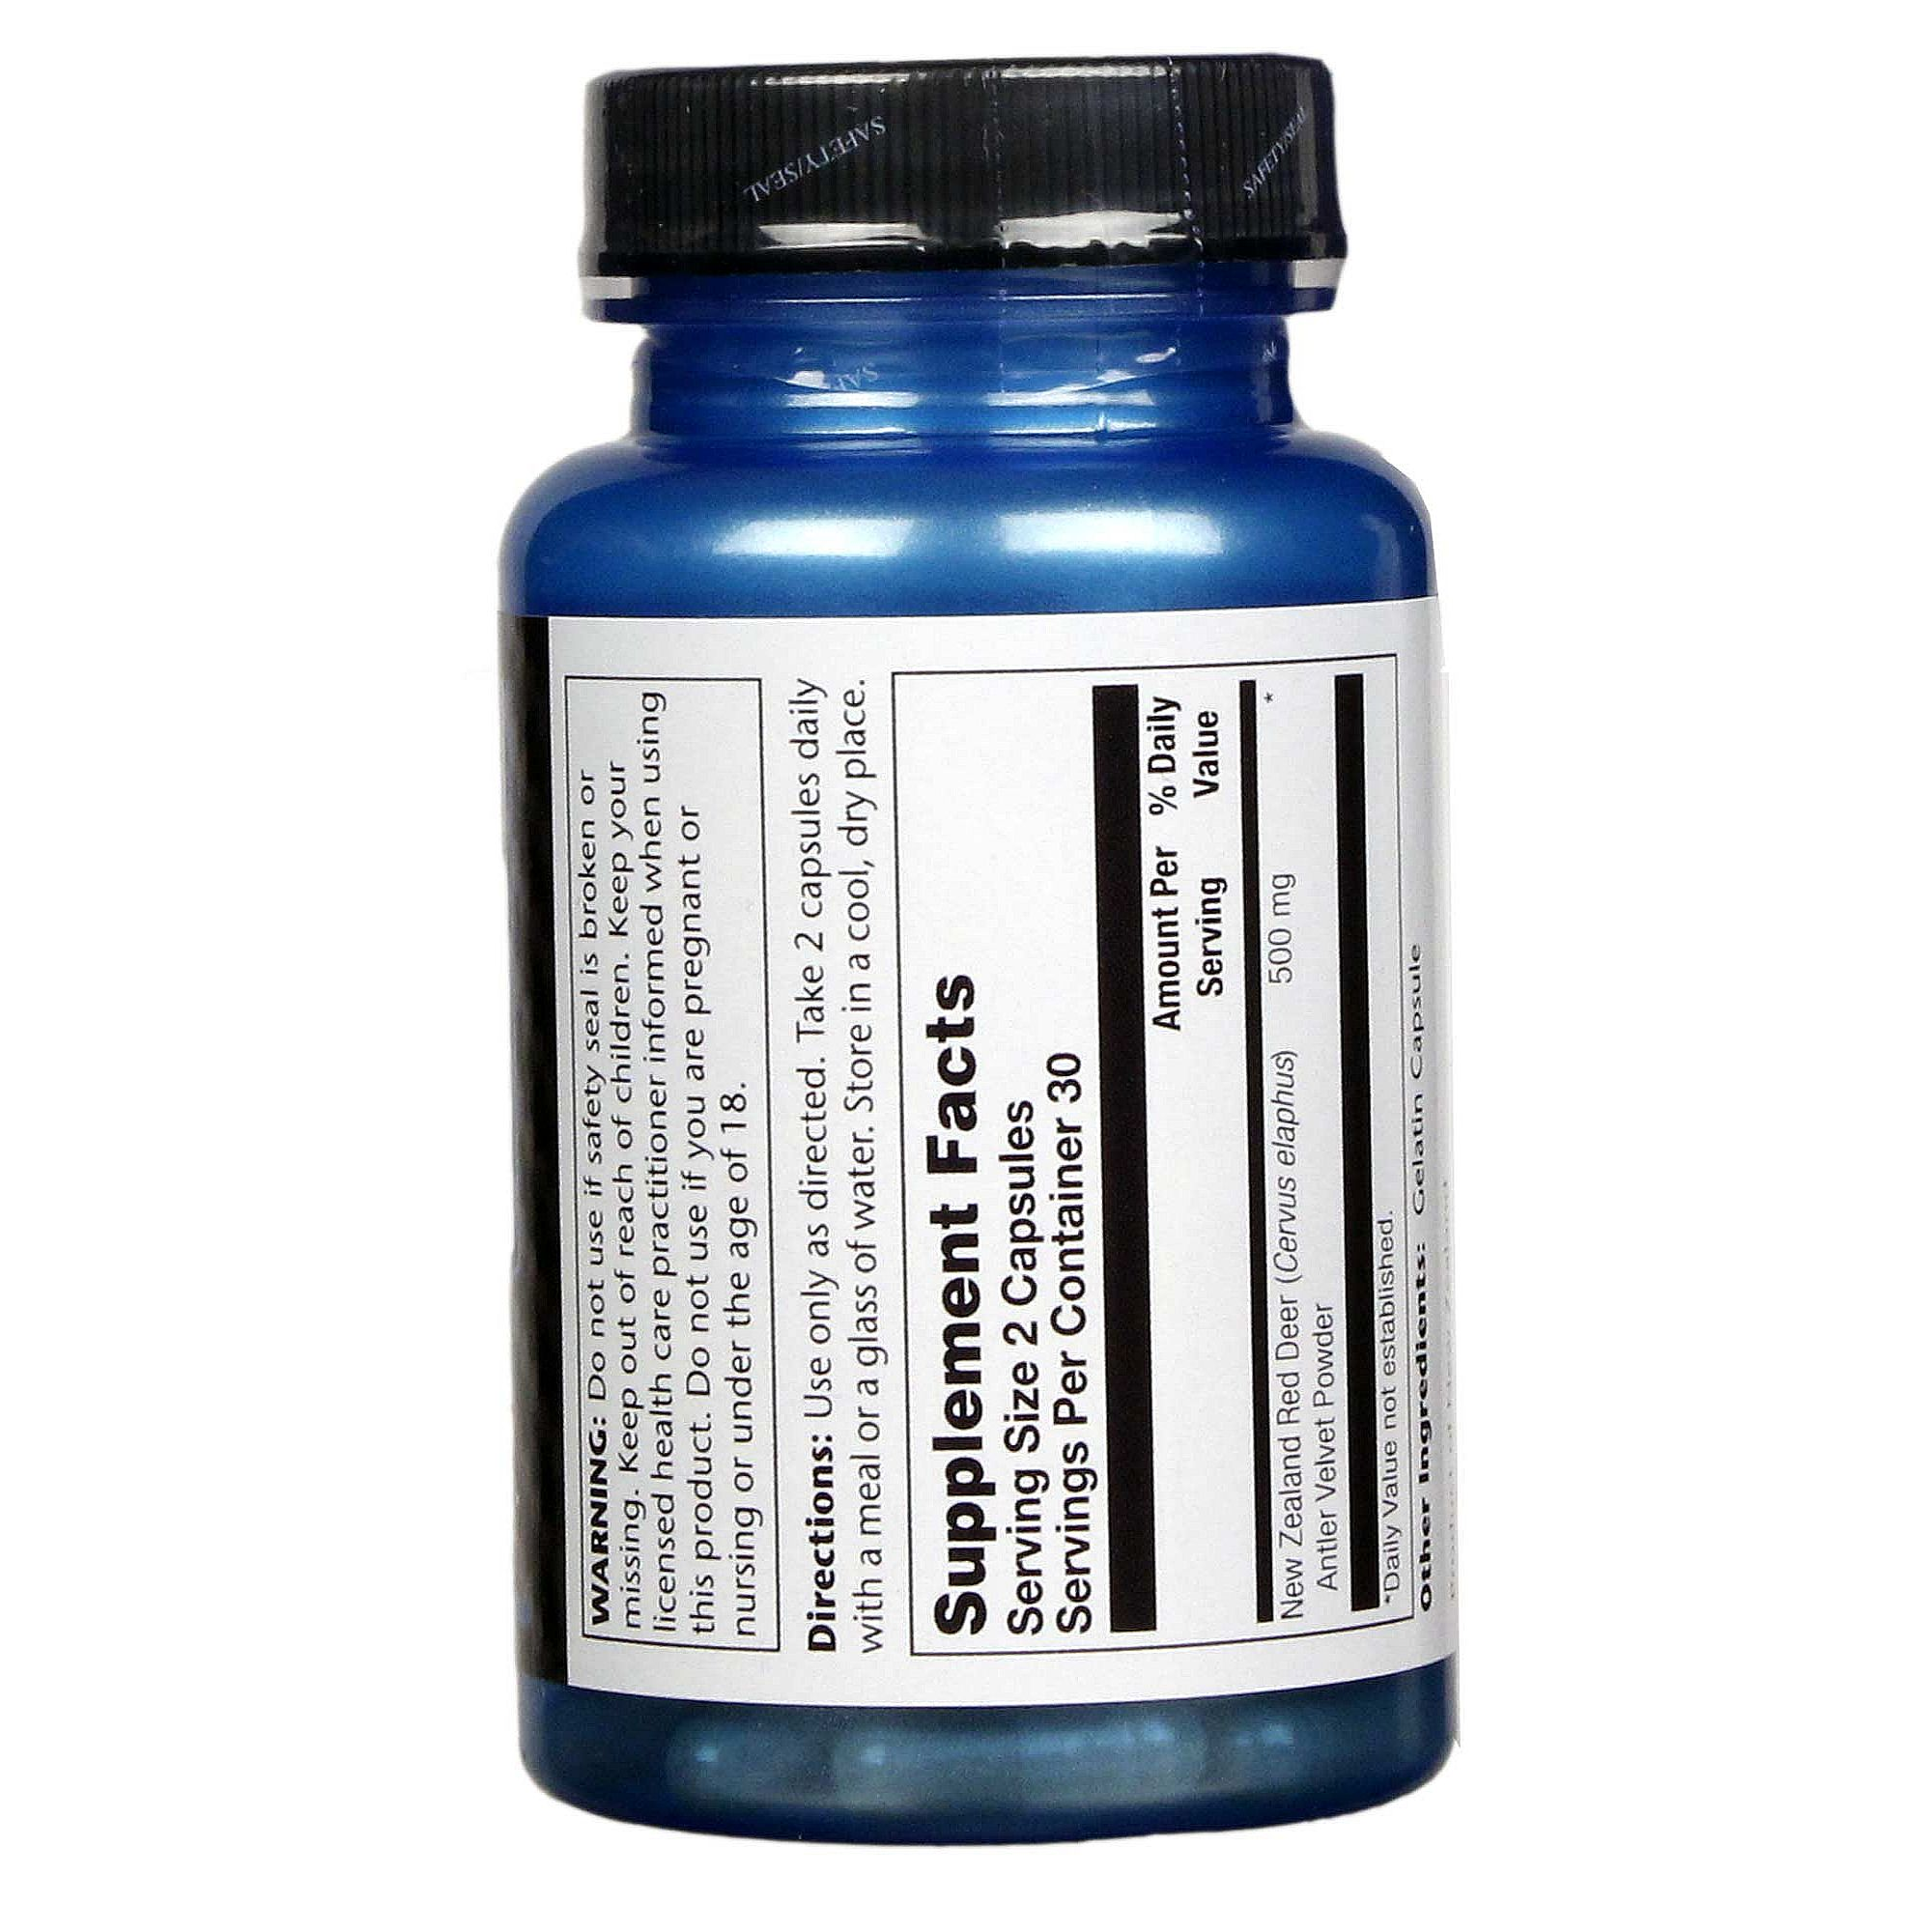 Diet sleeping pills photo 6